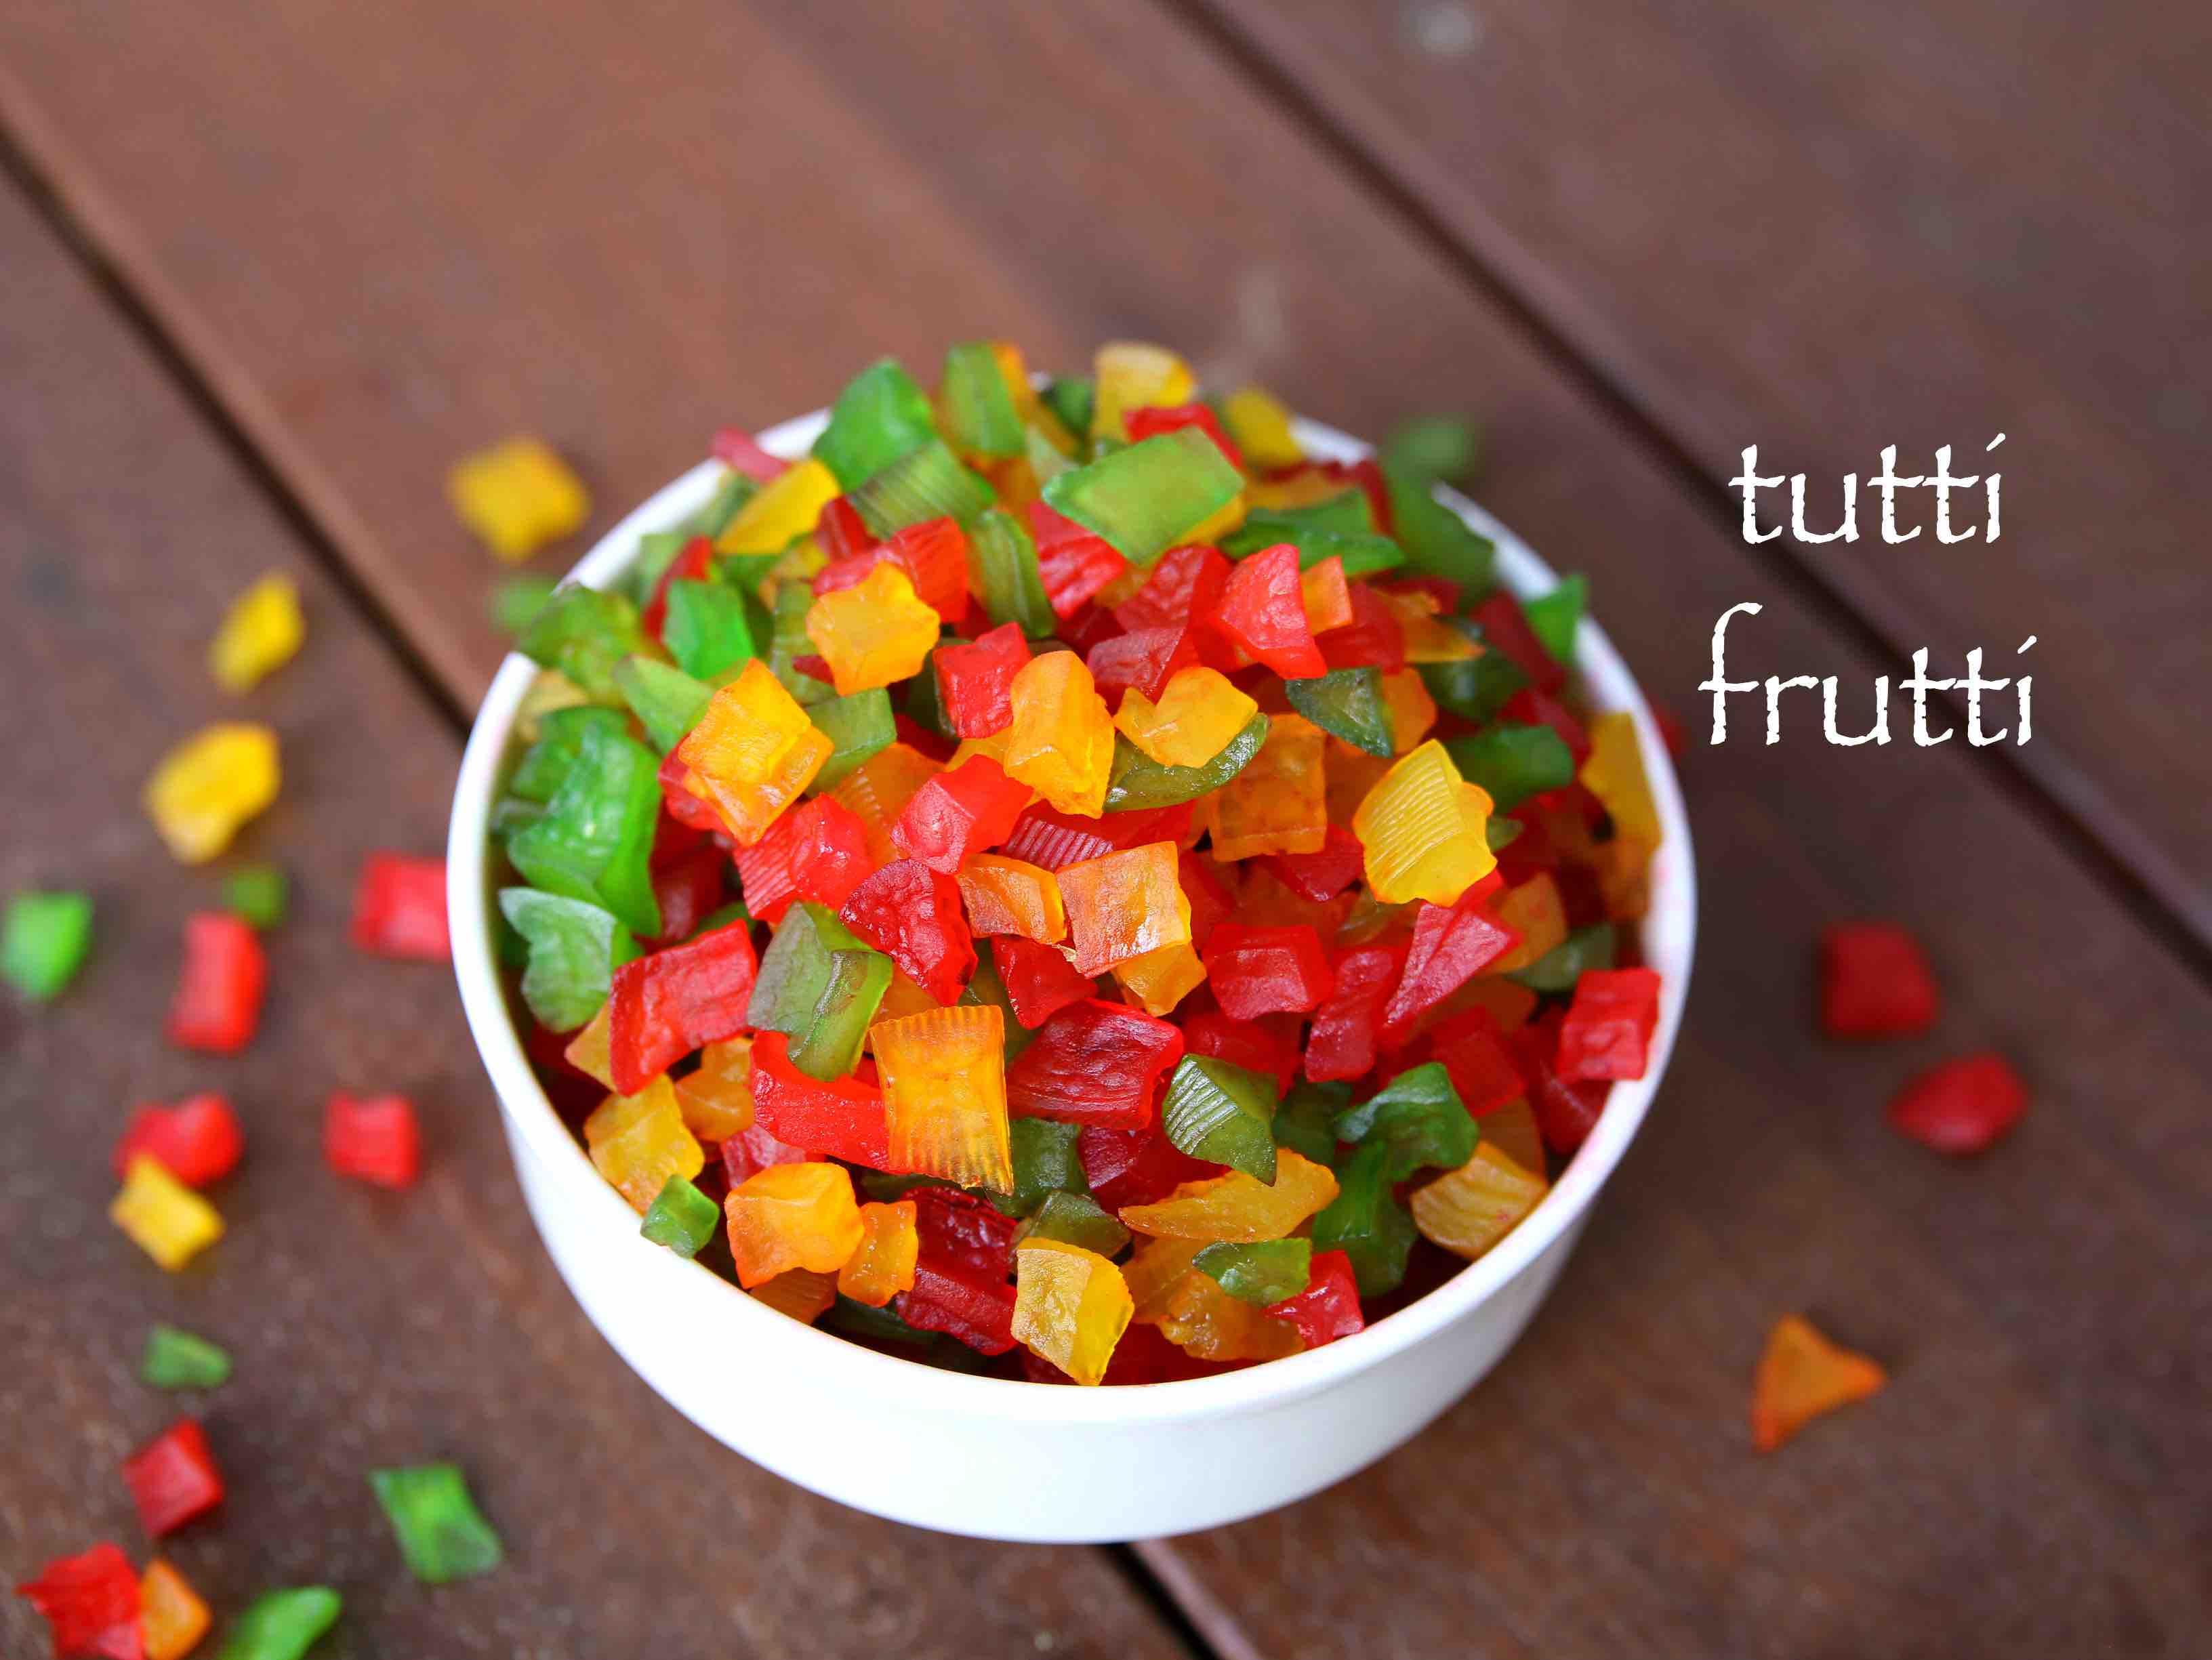 Tutti Frutti Recipe How To Make Tutti Frutti Tutty